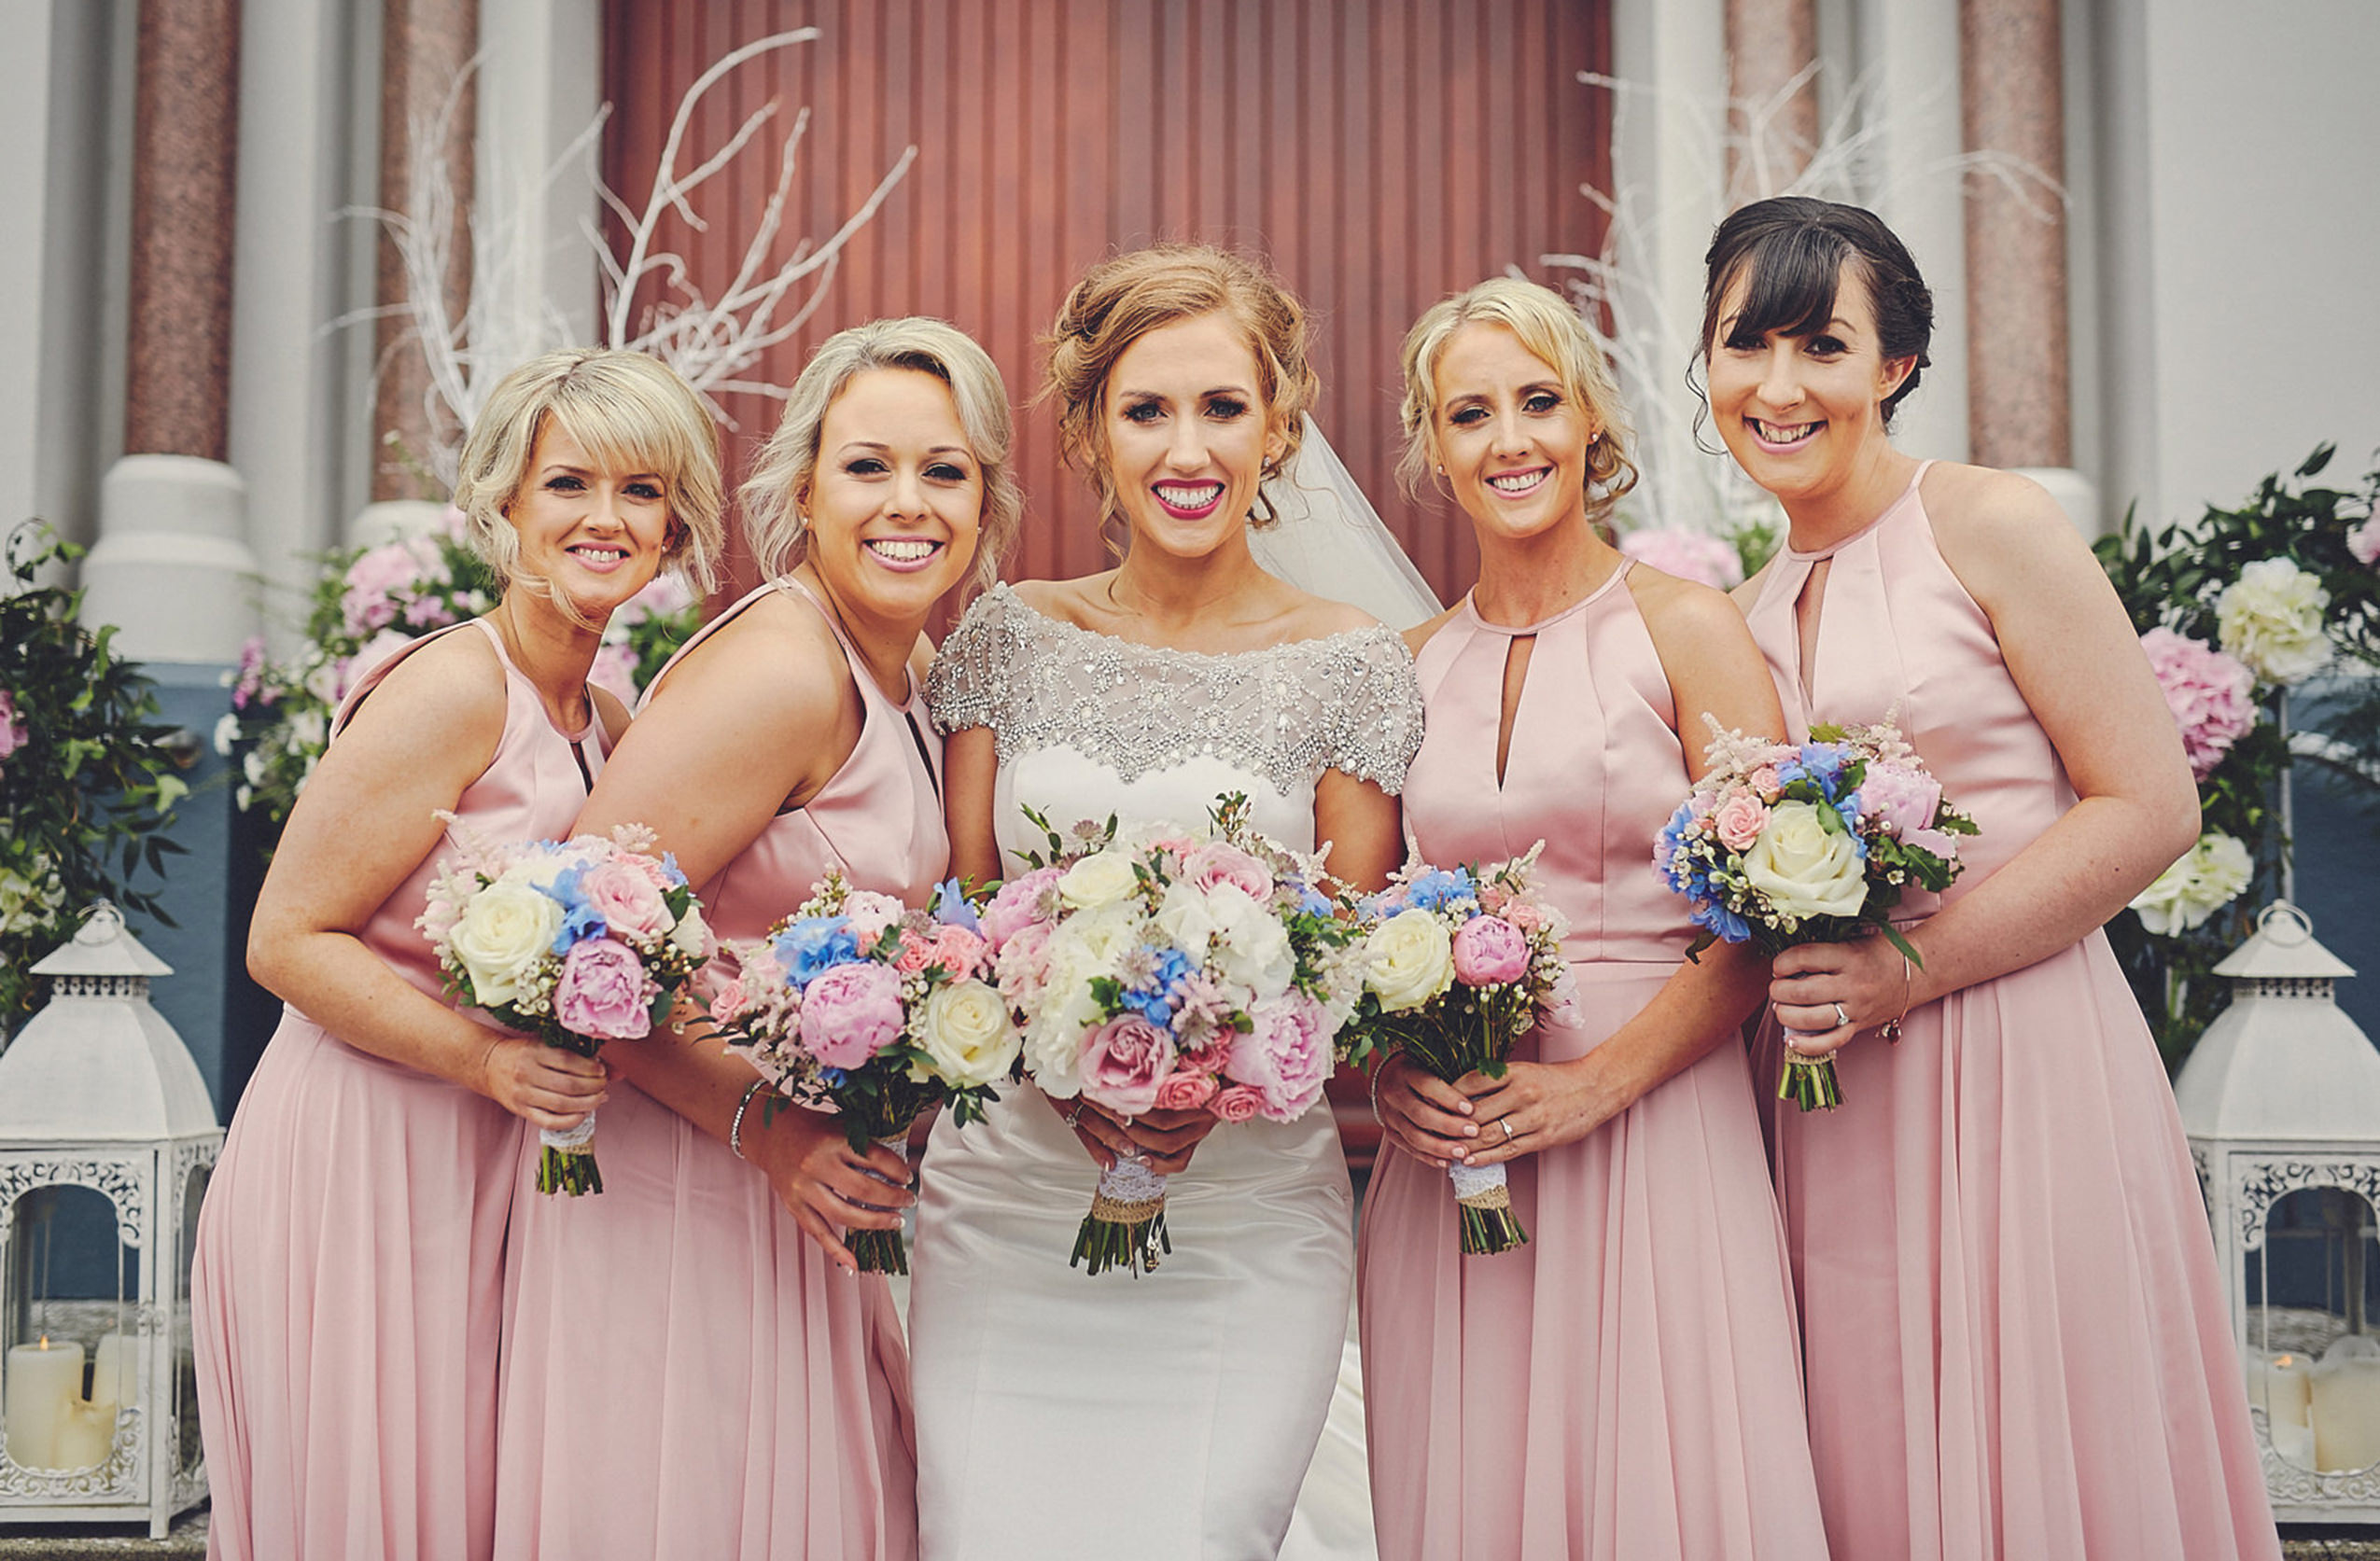 Nautical Wedding In Navy Blue Pink Confetti Daydreams: Nautical Wedding Bridesmaid Dresses At Websimilar.org